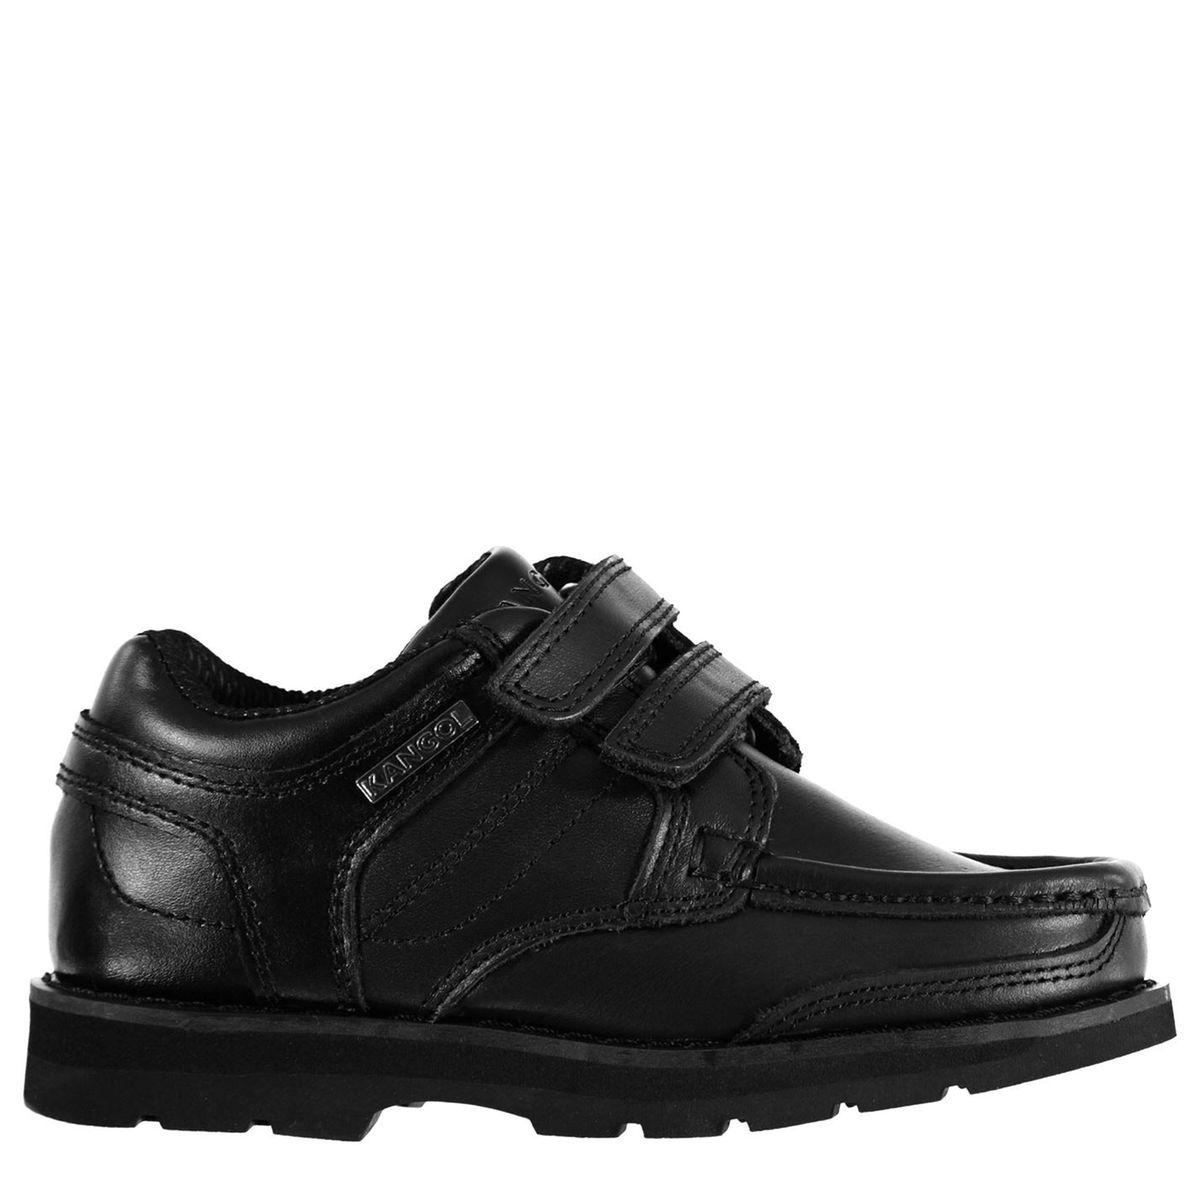 Chaussures mocassins bande velcro